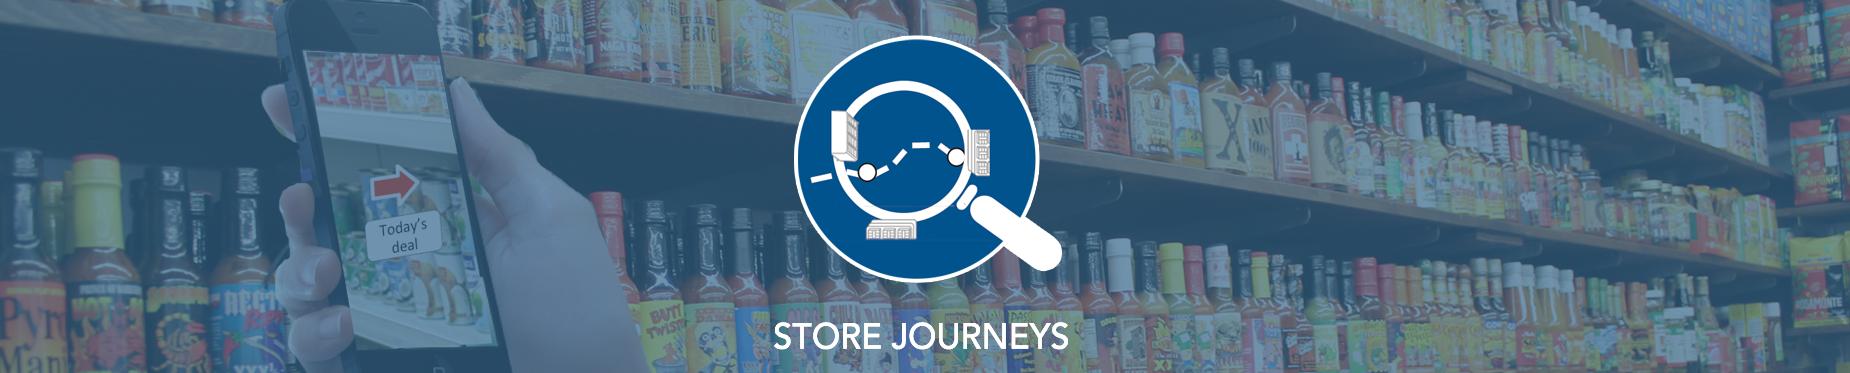 store_journeys4